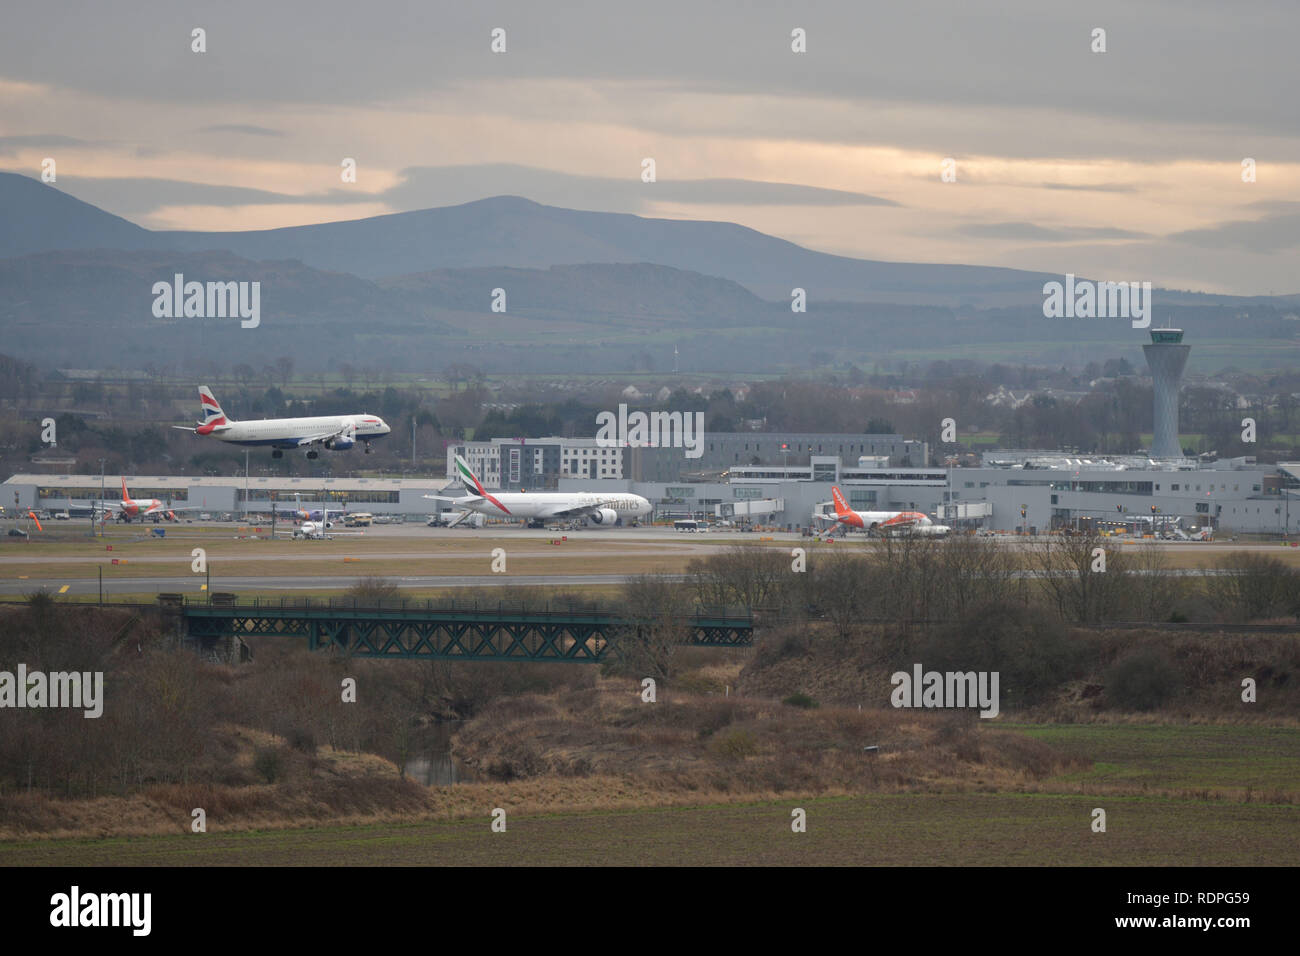 Edinburgh    January  18 2019;   General view of Edinburgh Airport.  credit steven scott taylor / alamy live news Stock Photo